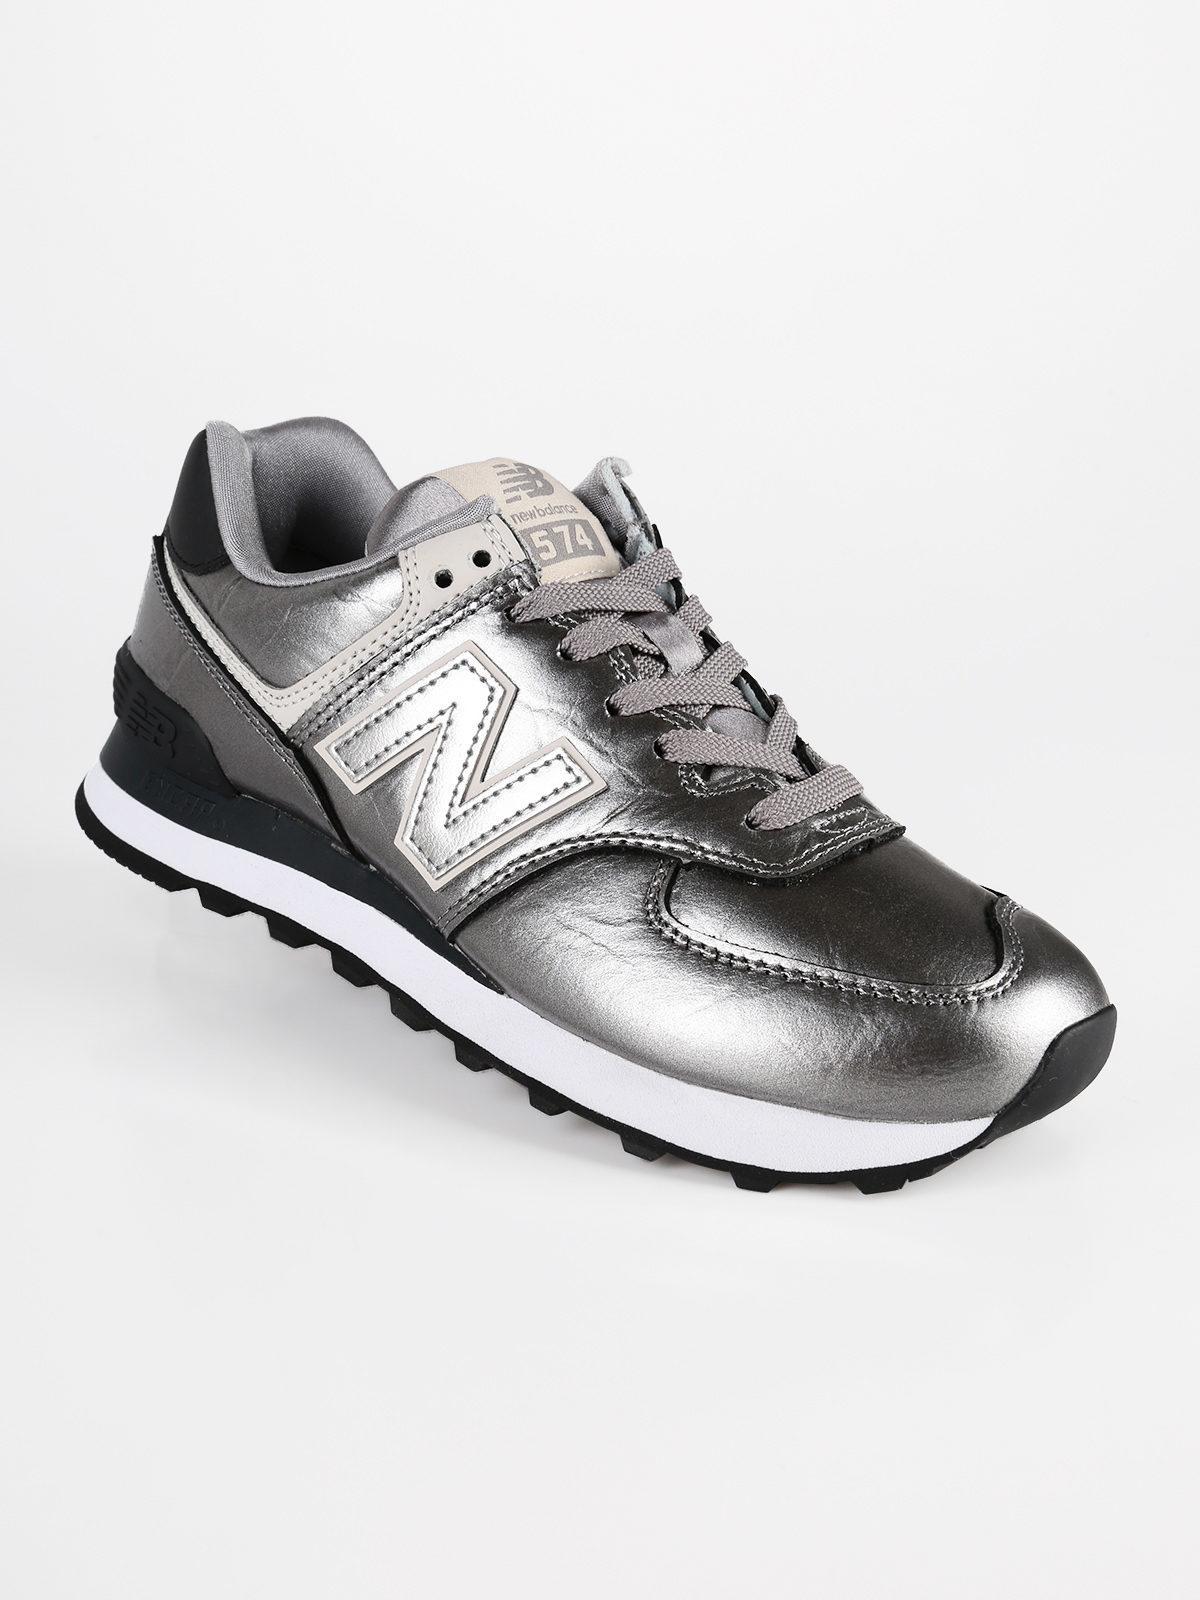 New Balance Sneakers basse WL574 argento: Scarpe sportive